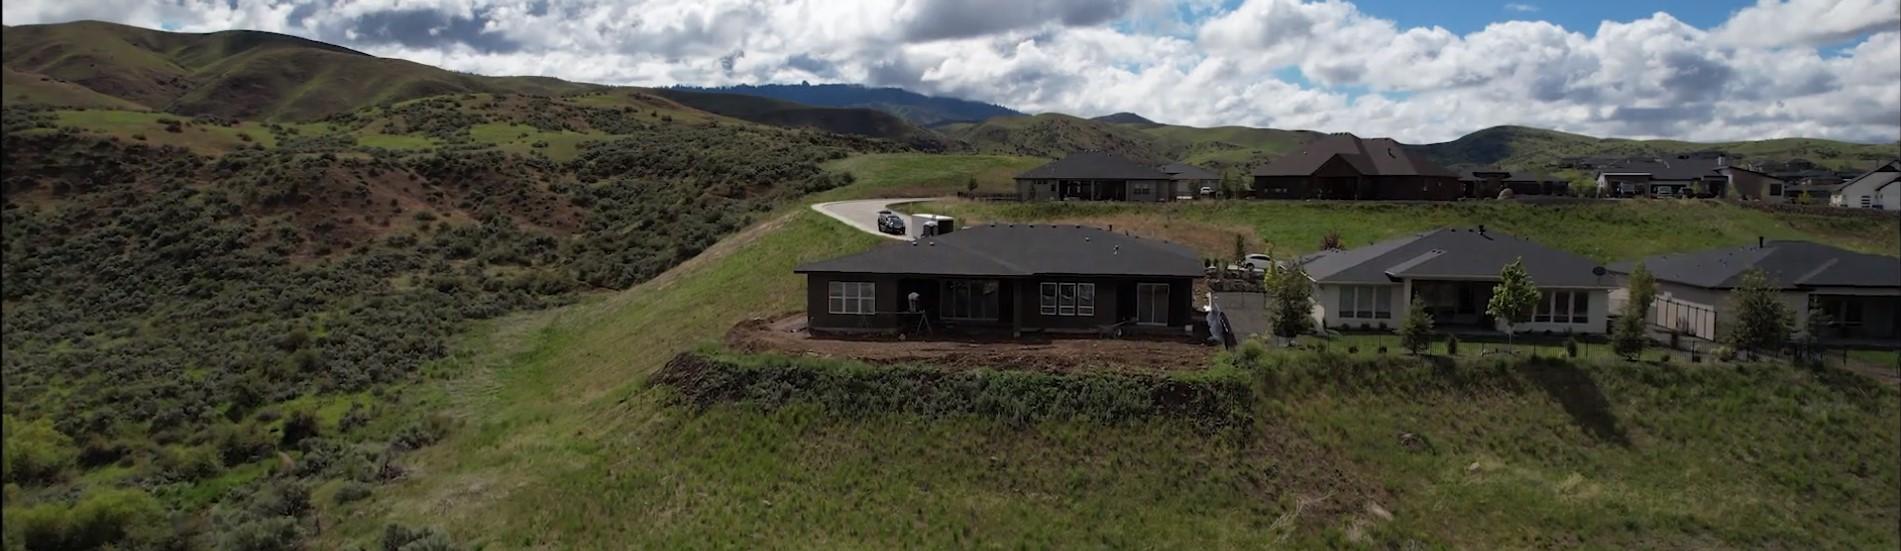 Image of new housing in rural Idaho.